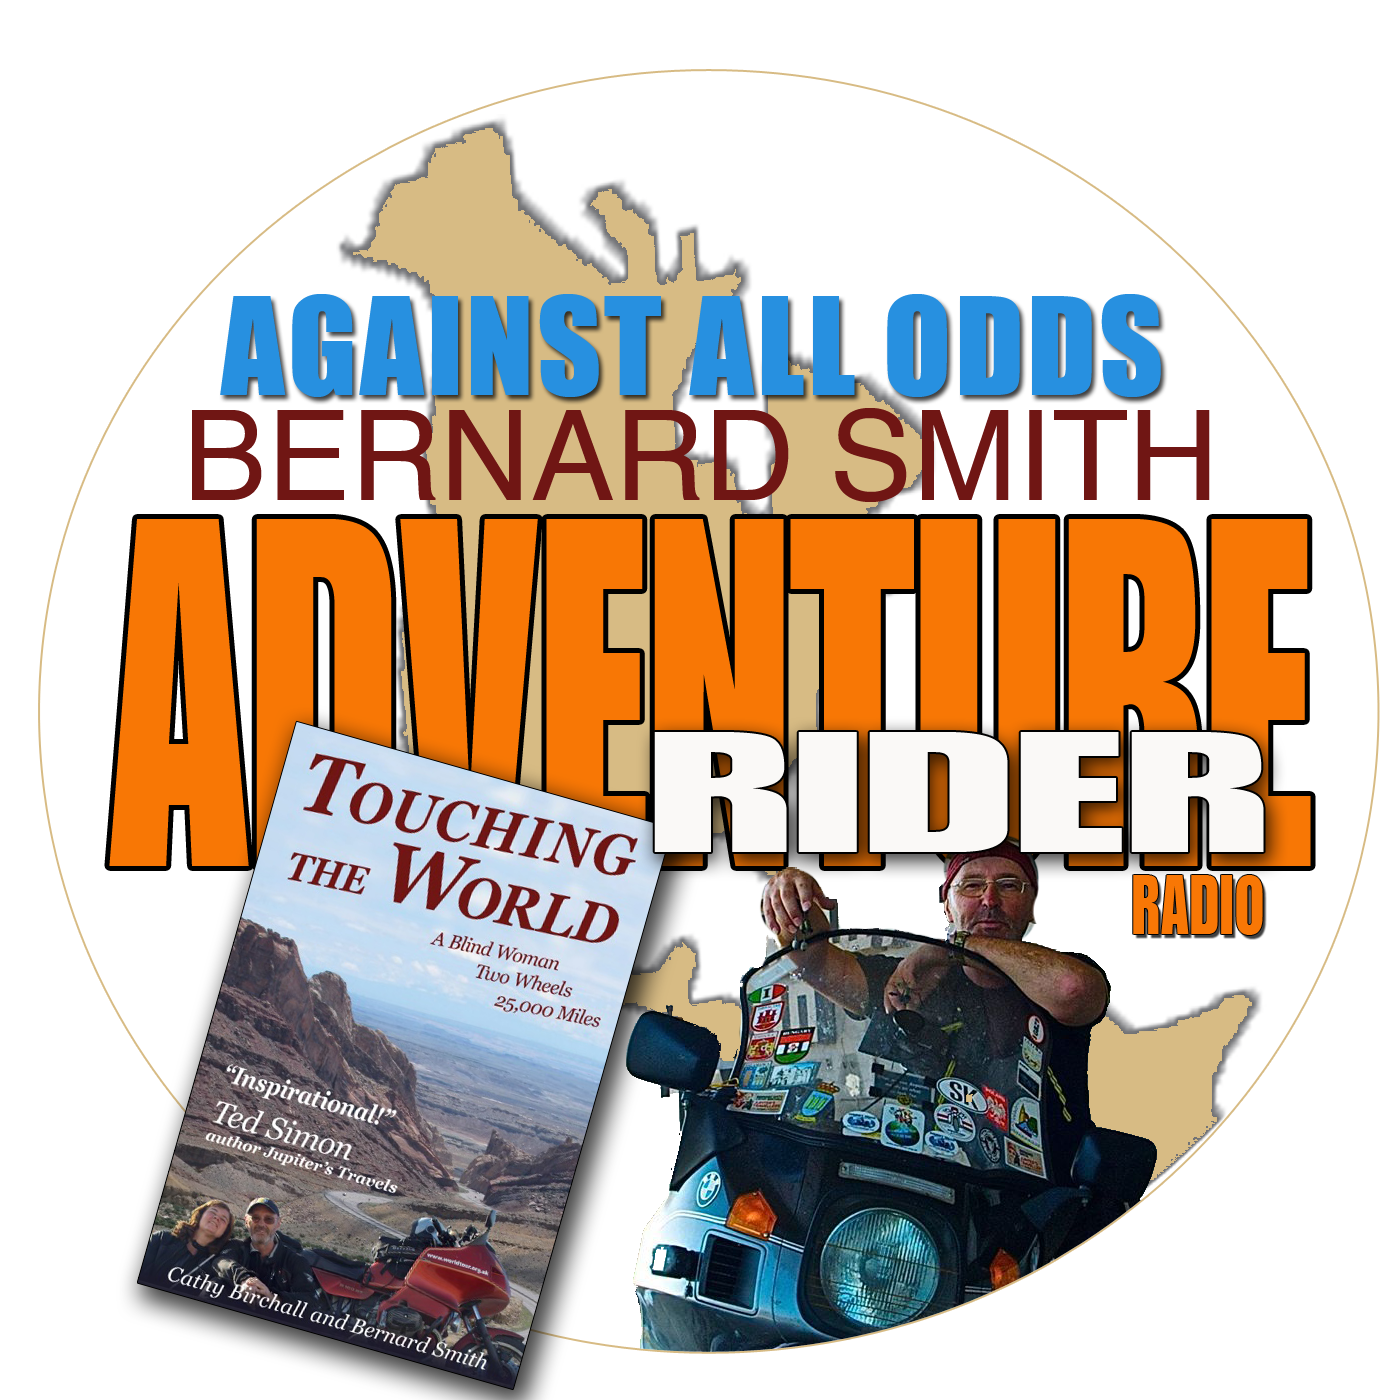 Bernard-Smith-Cathy-Birchall-Touching-The-World